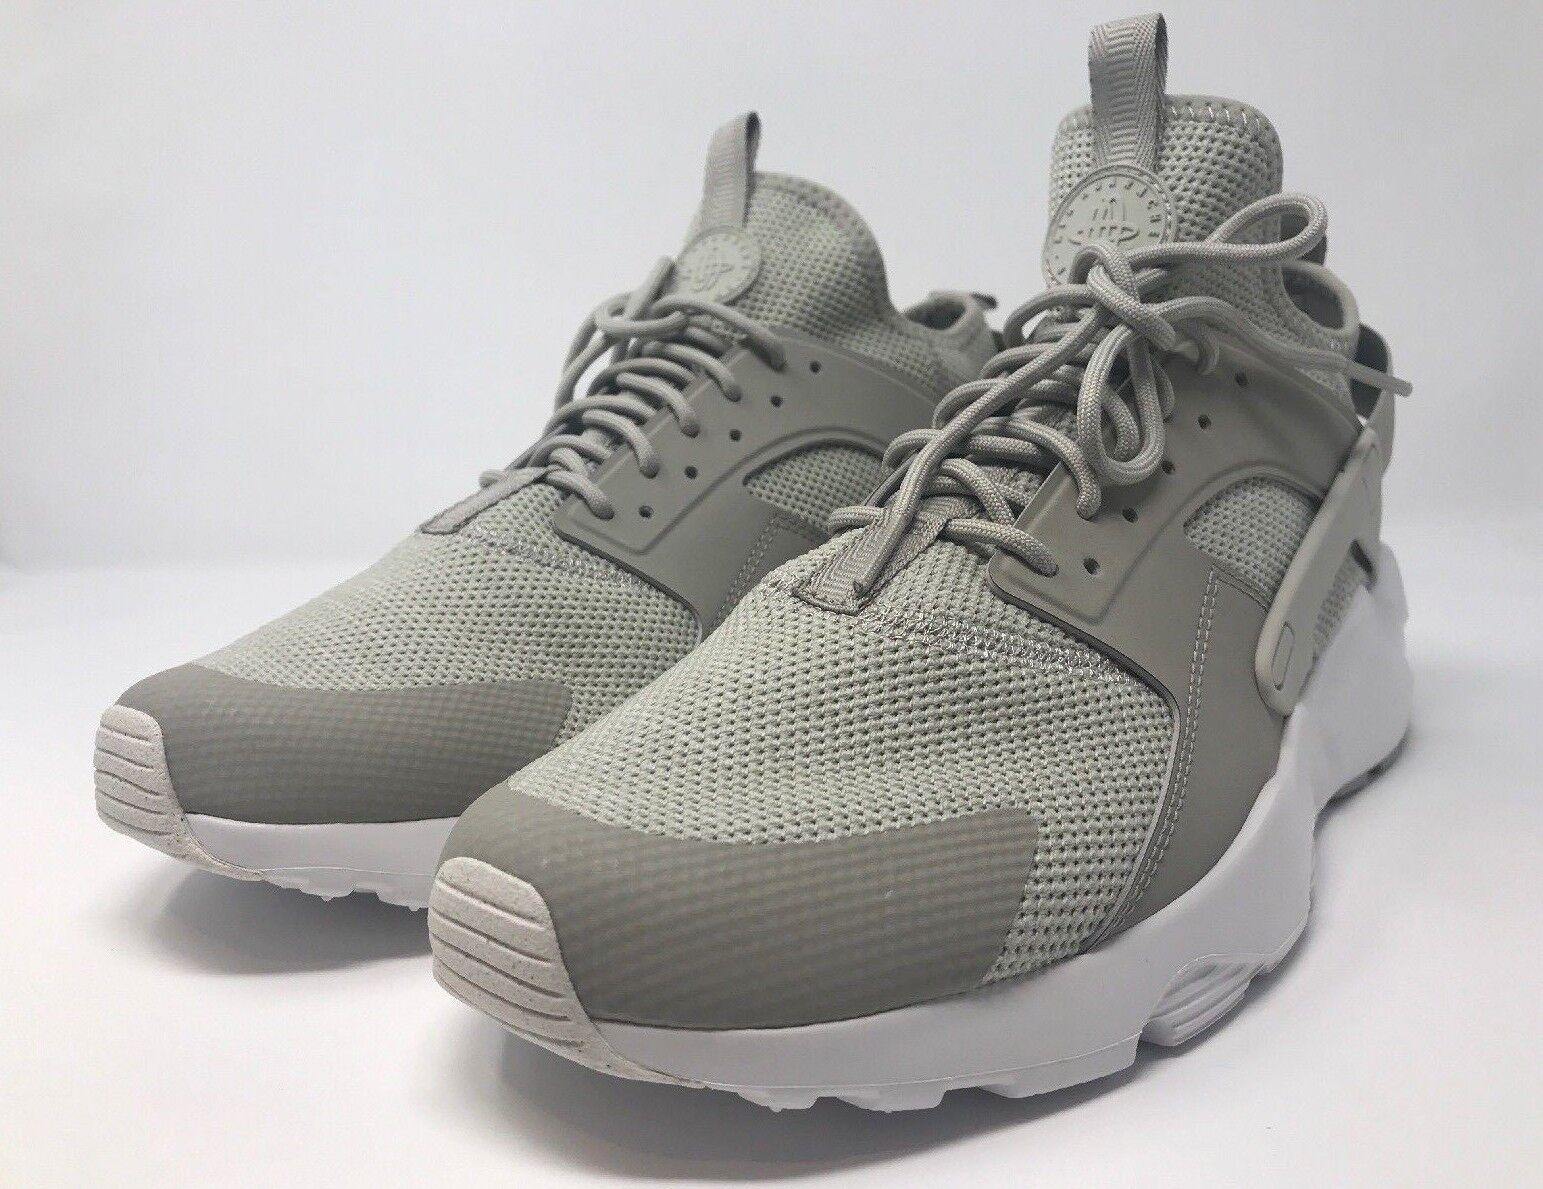 130 Nike Air Huarache Run Ultra BR Men's Size 11 Pale Grey 833147 002